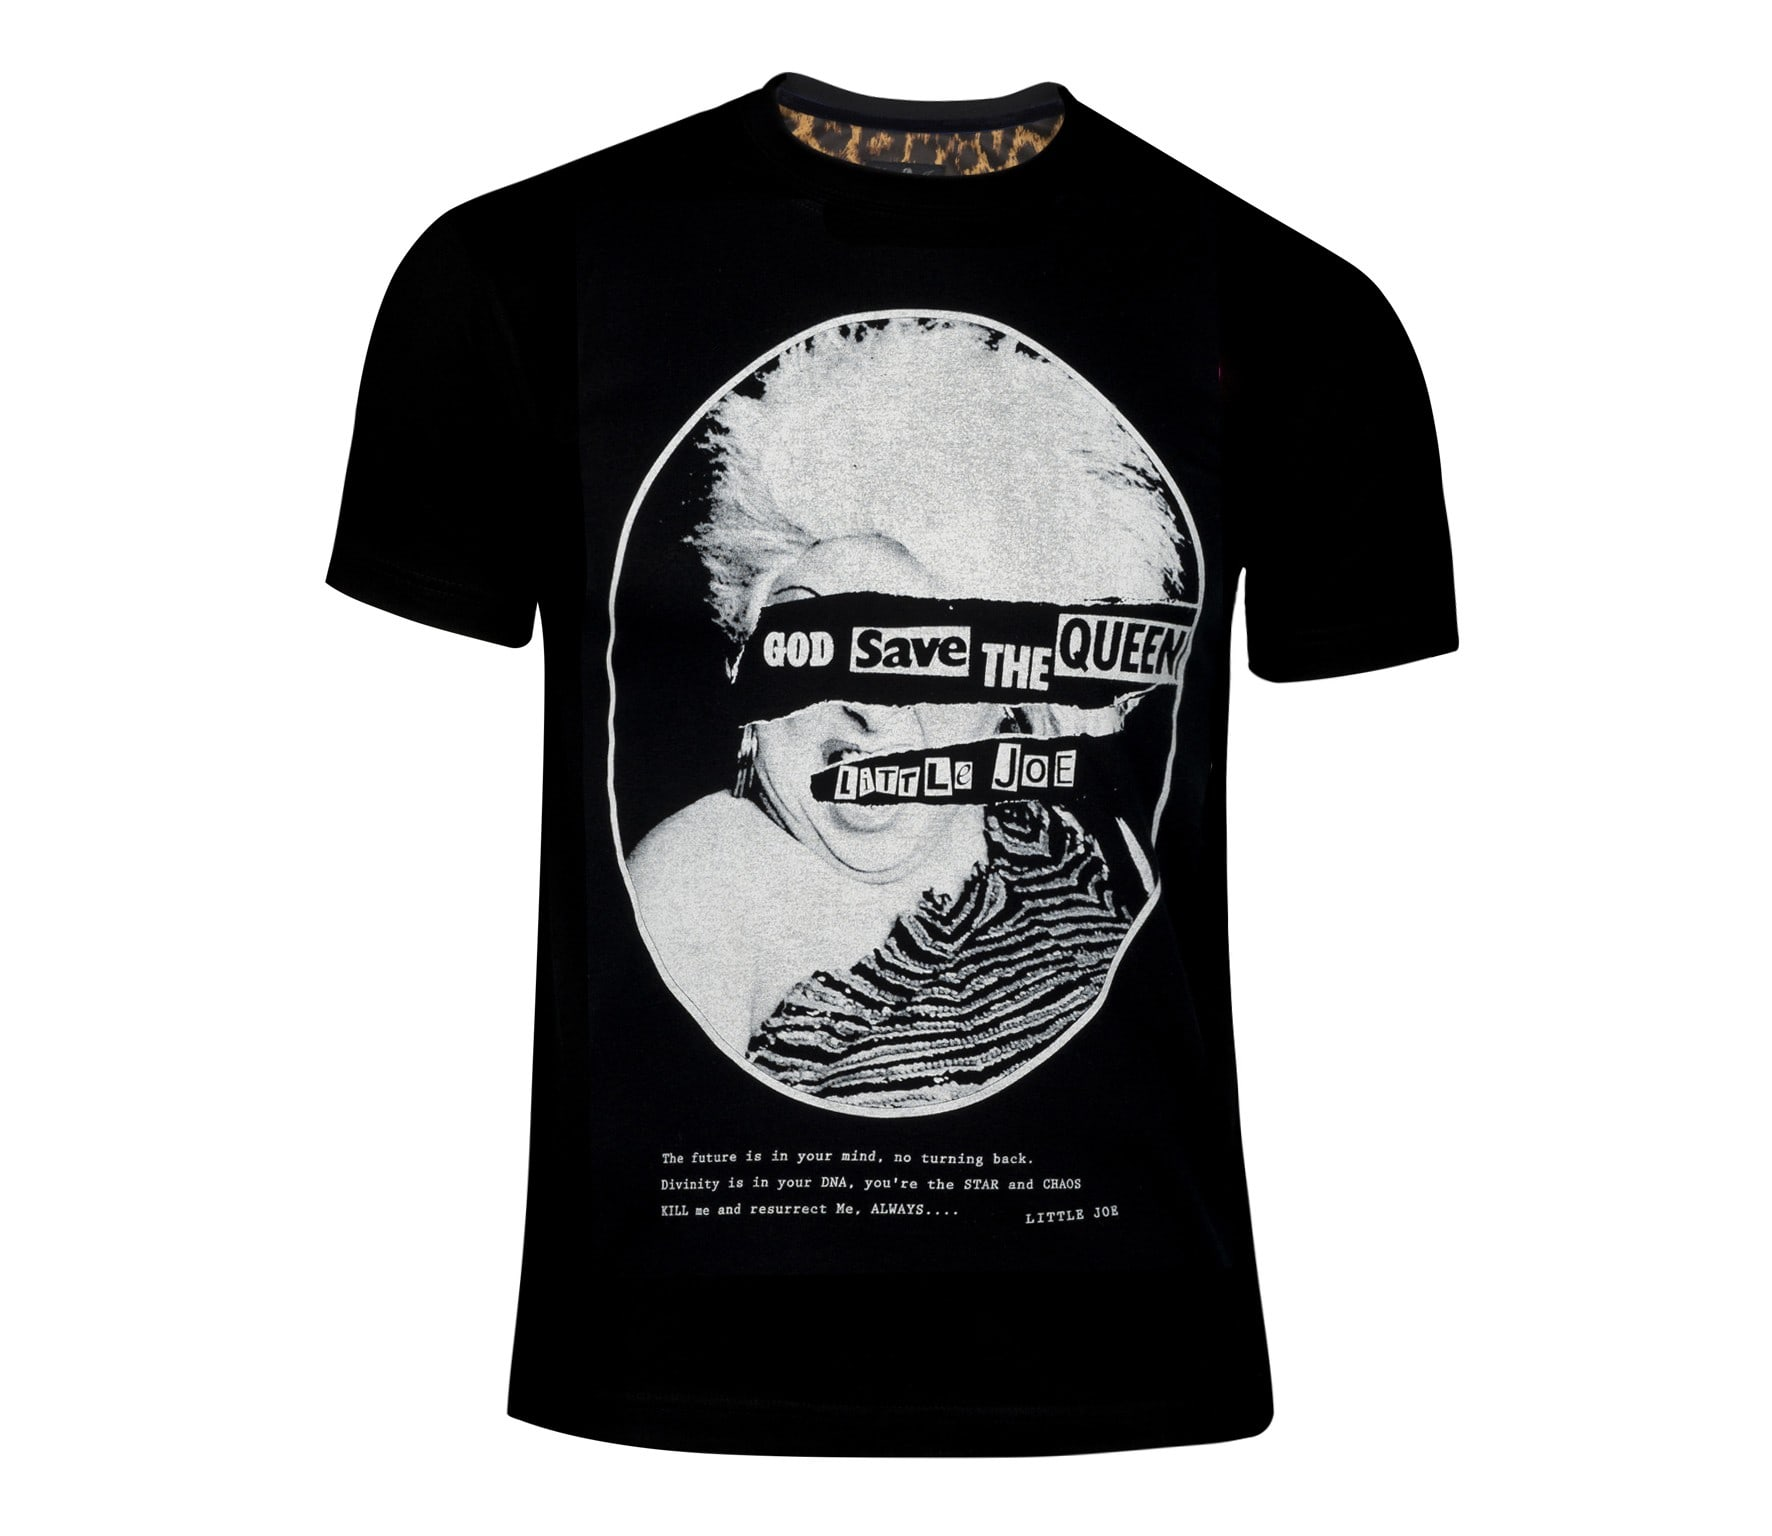 bastante agradable siempre popular costo moderado Camiseta Divine - God Save The Queen Negro